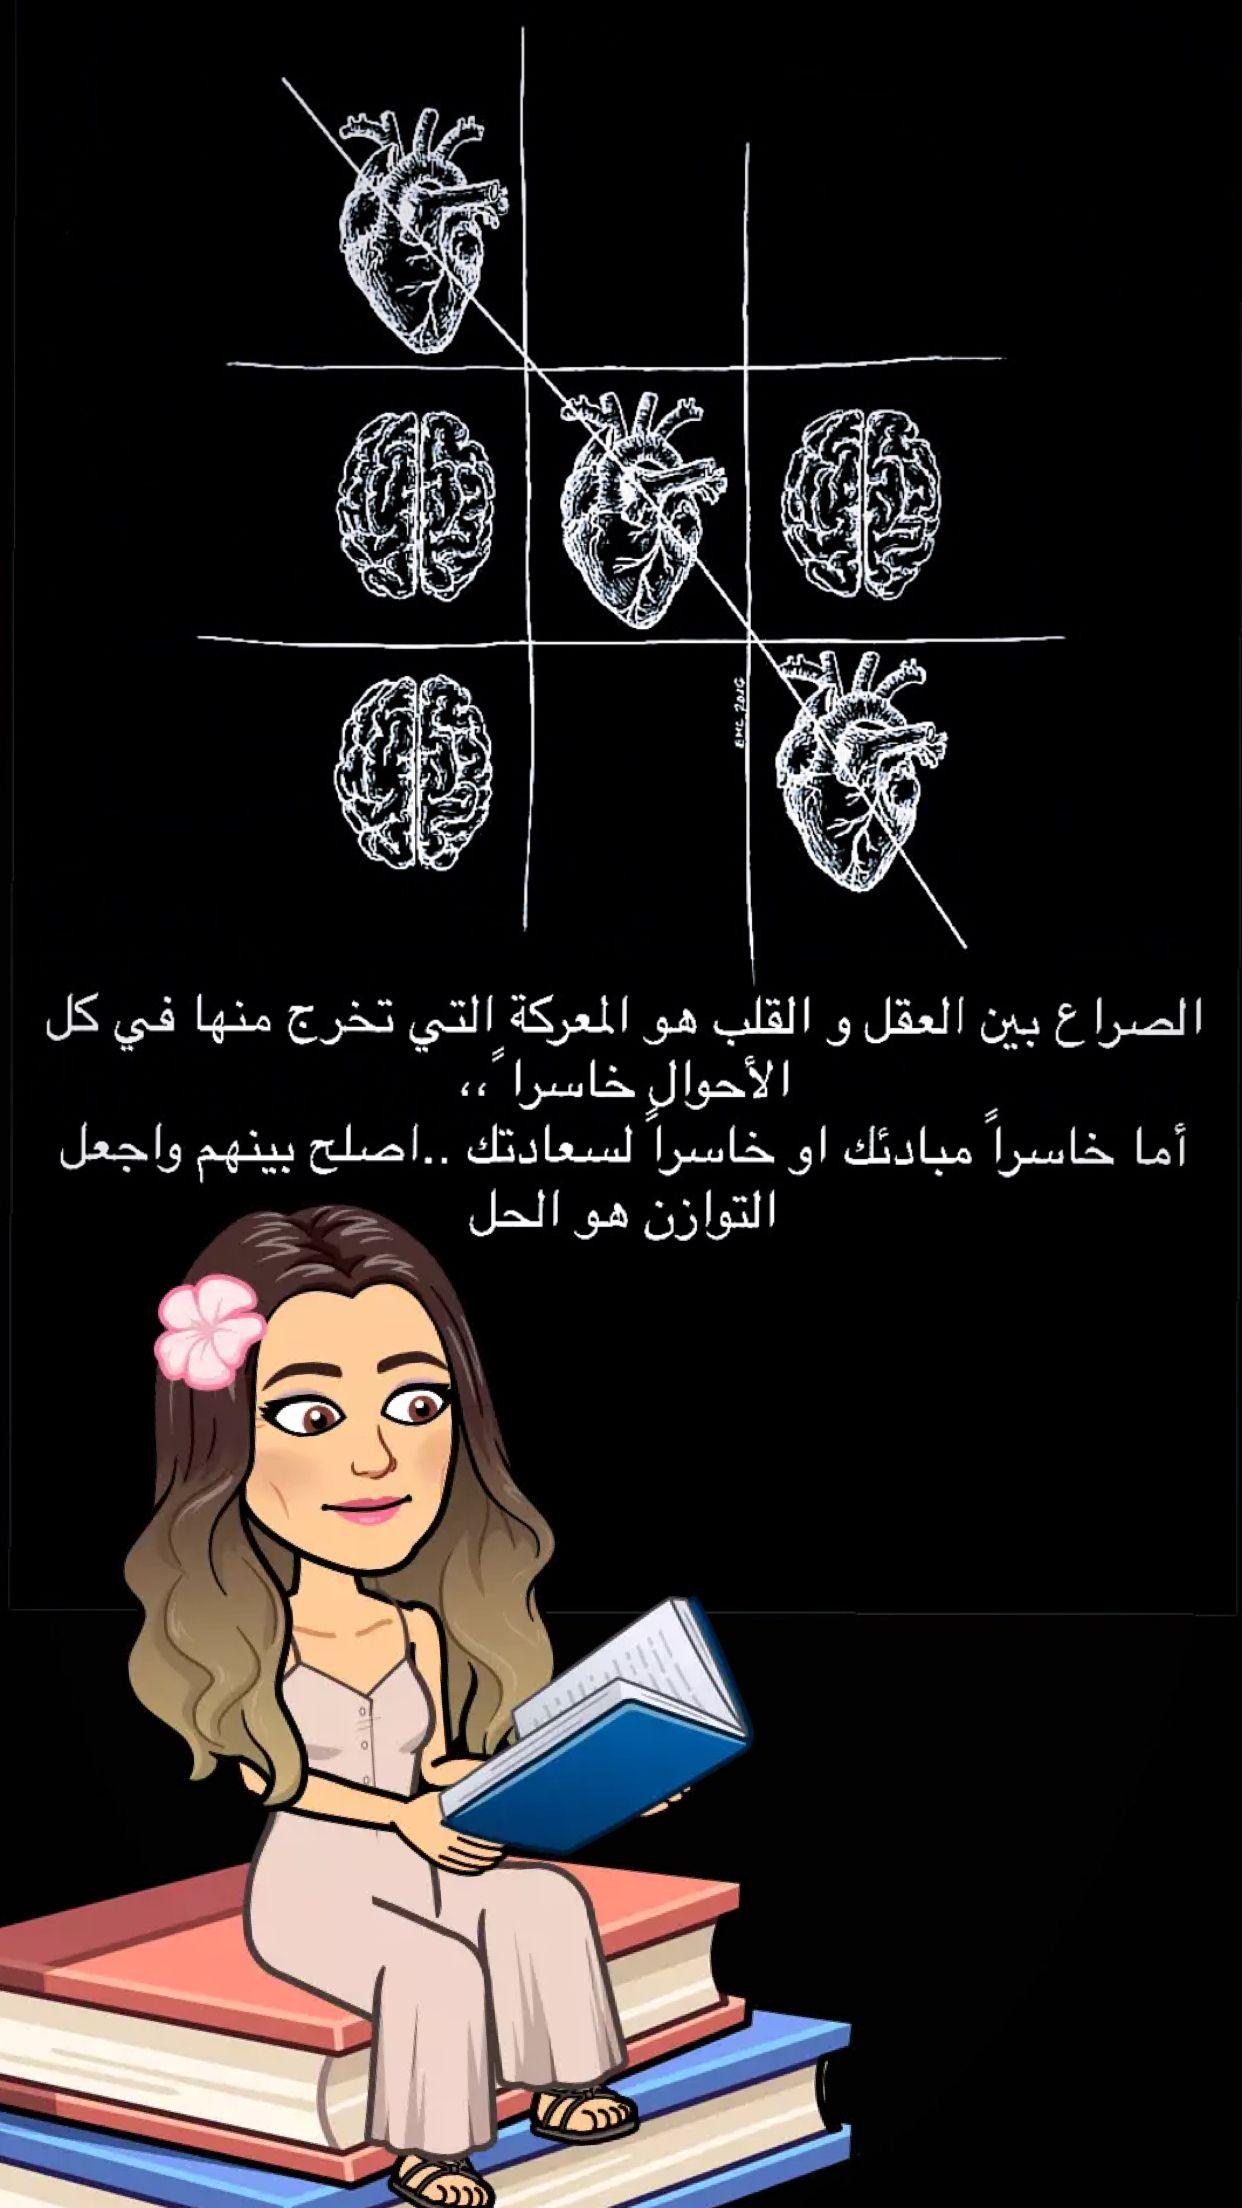 Pin By Meriem Boudhane On My Snap Emoji Wallpaper Beauty Makeup Tutorial Arabic Calligraphy Art